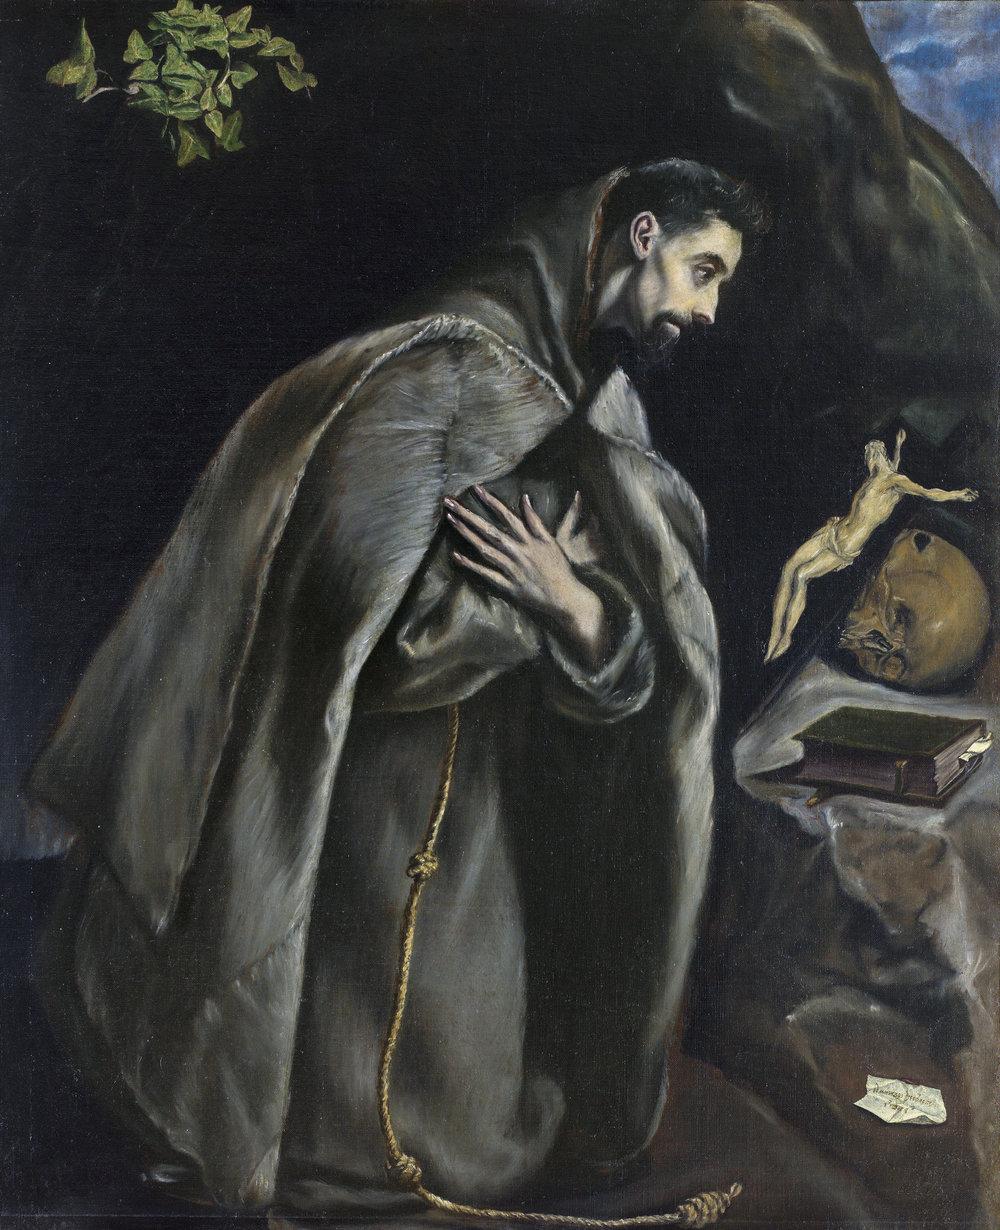 El_Greco_-_St_Francis_in_Prayer_before_the_Crucifix_-_WGA10474.jpg